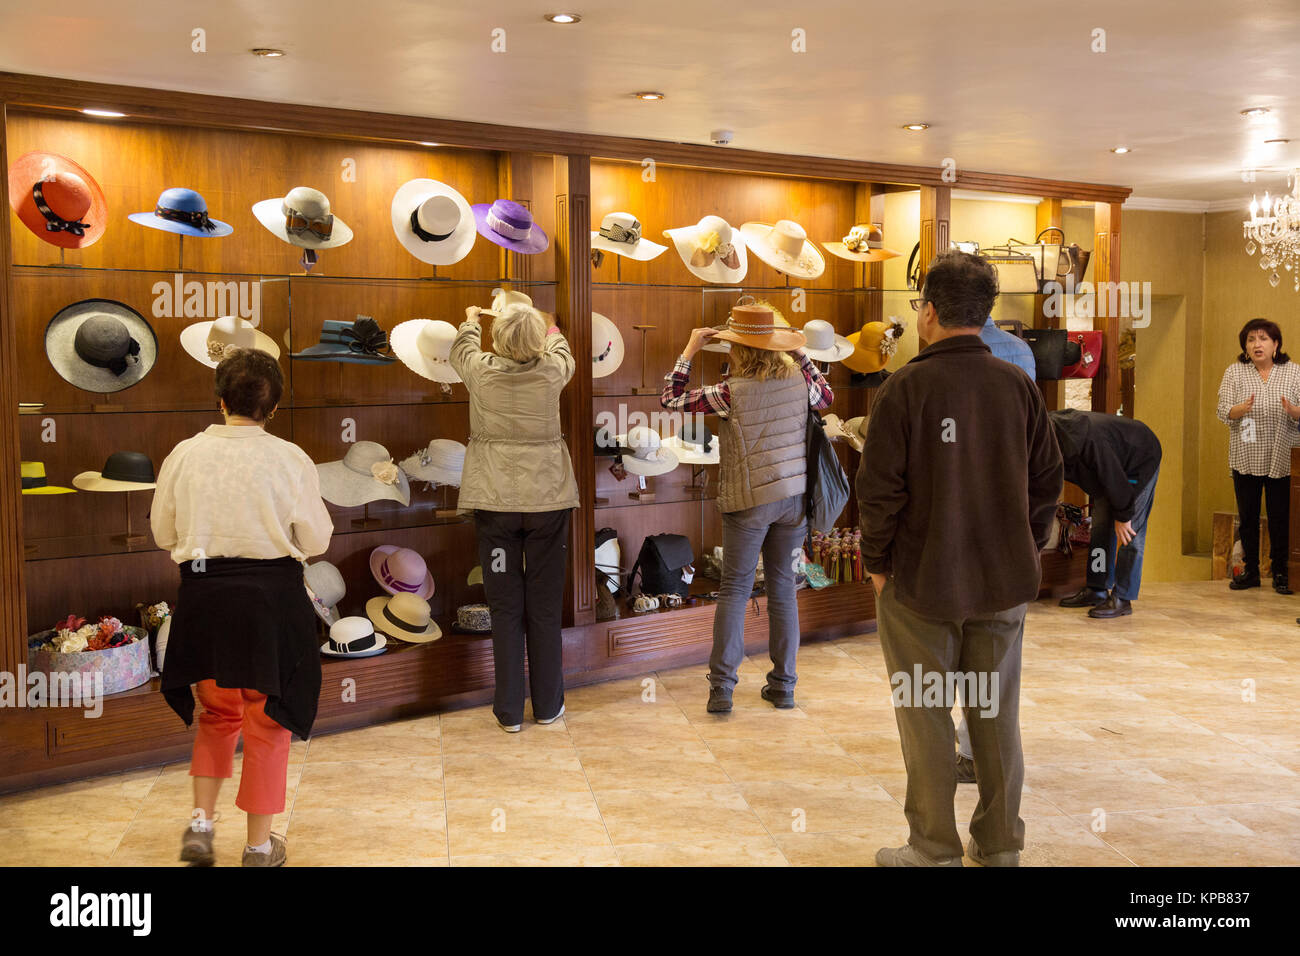 Panama Hat store - people buying panama hats 3a0b2c46cc1